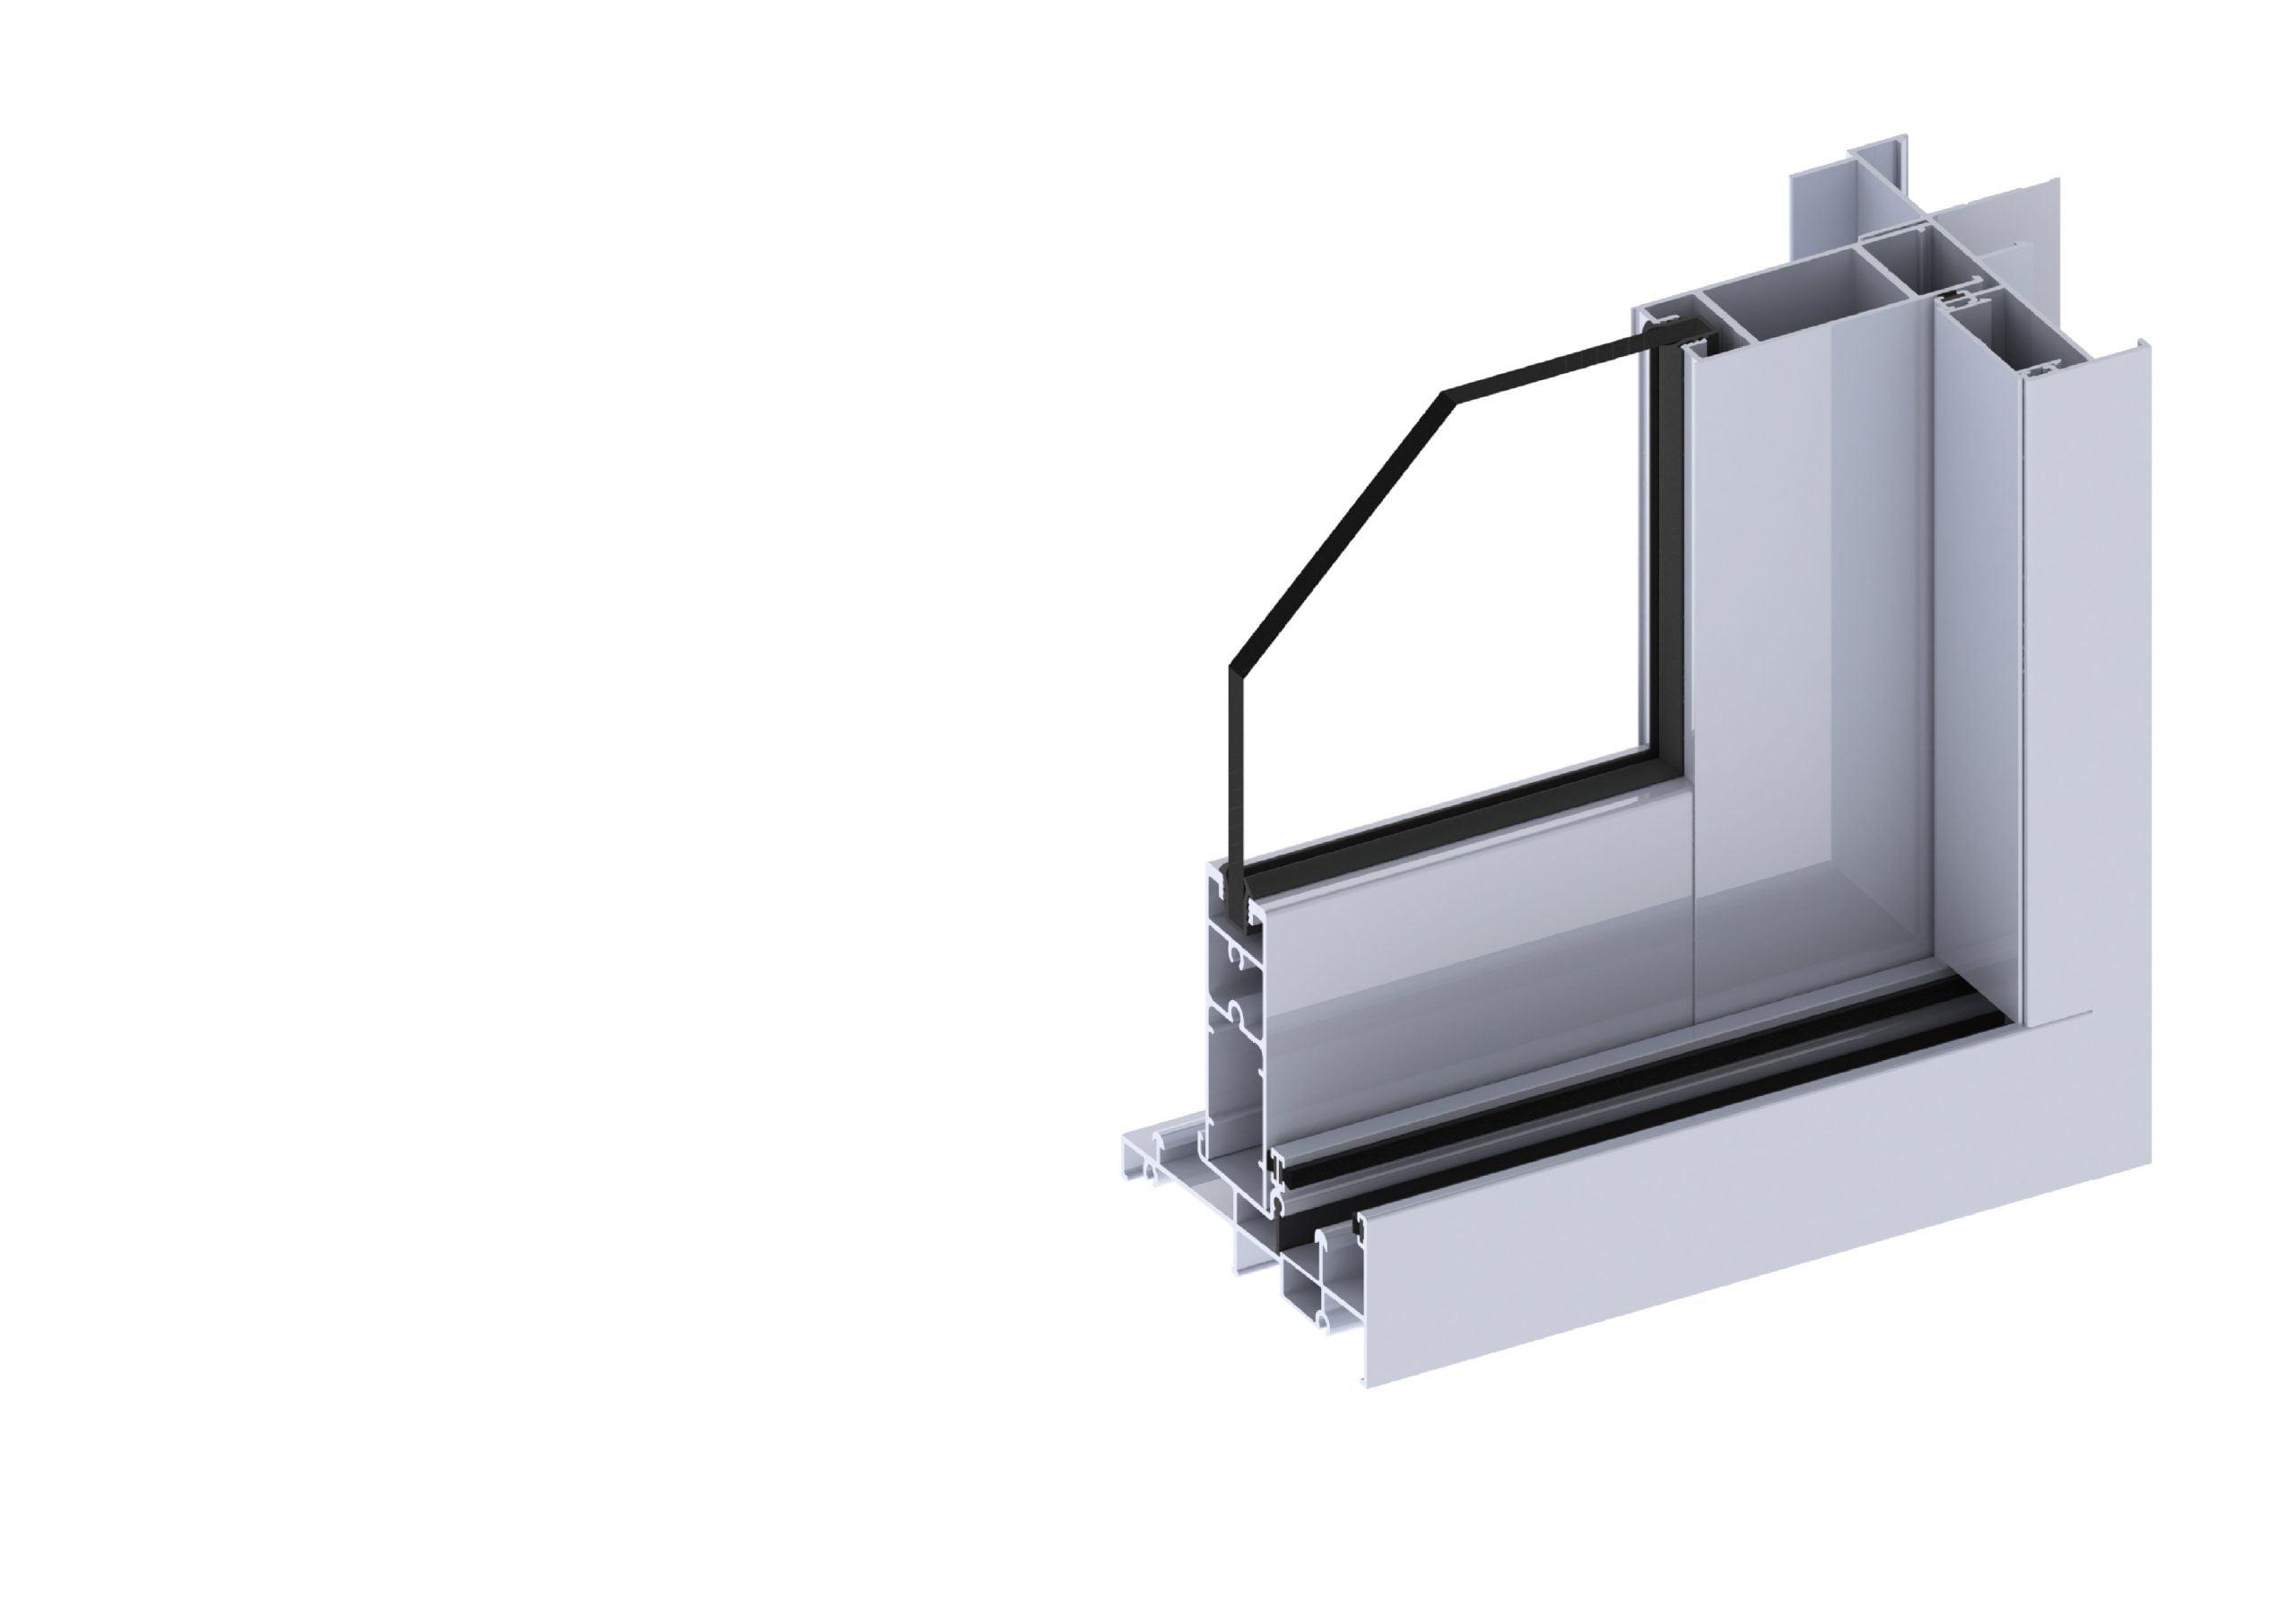 Paragon sliding door section